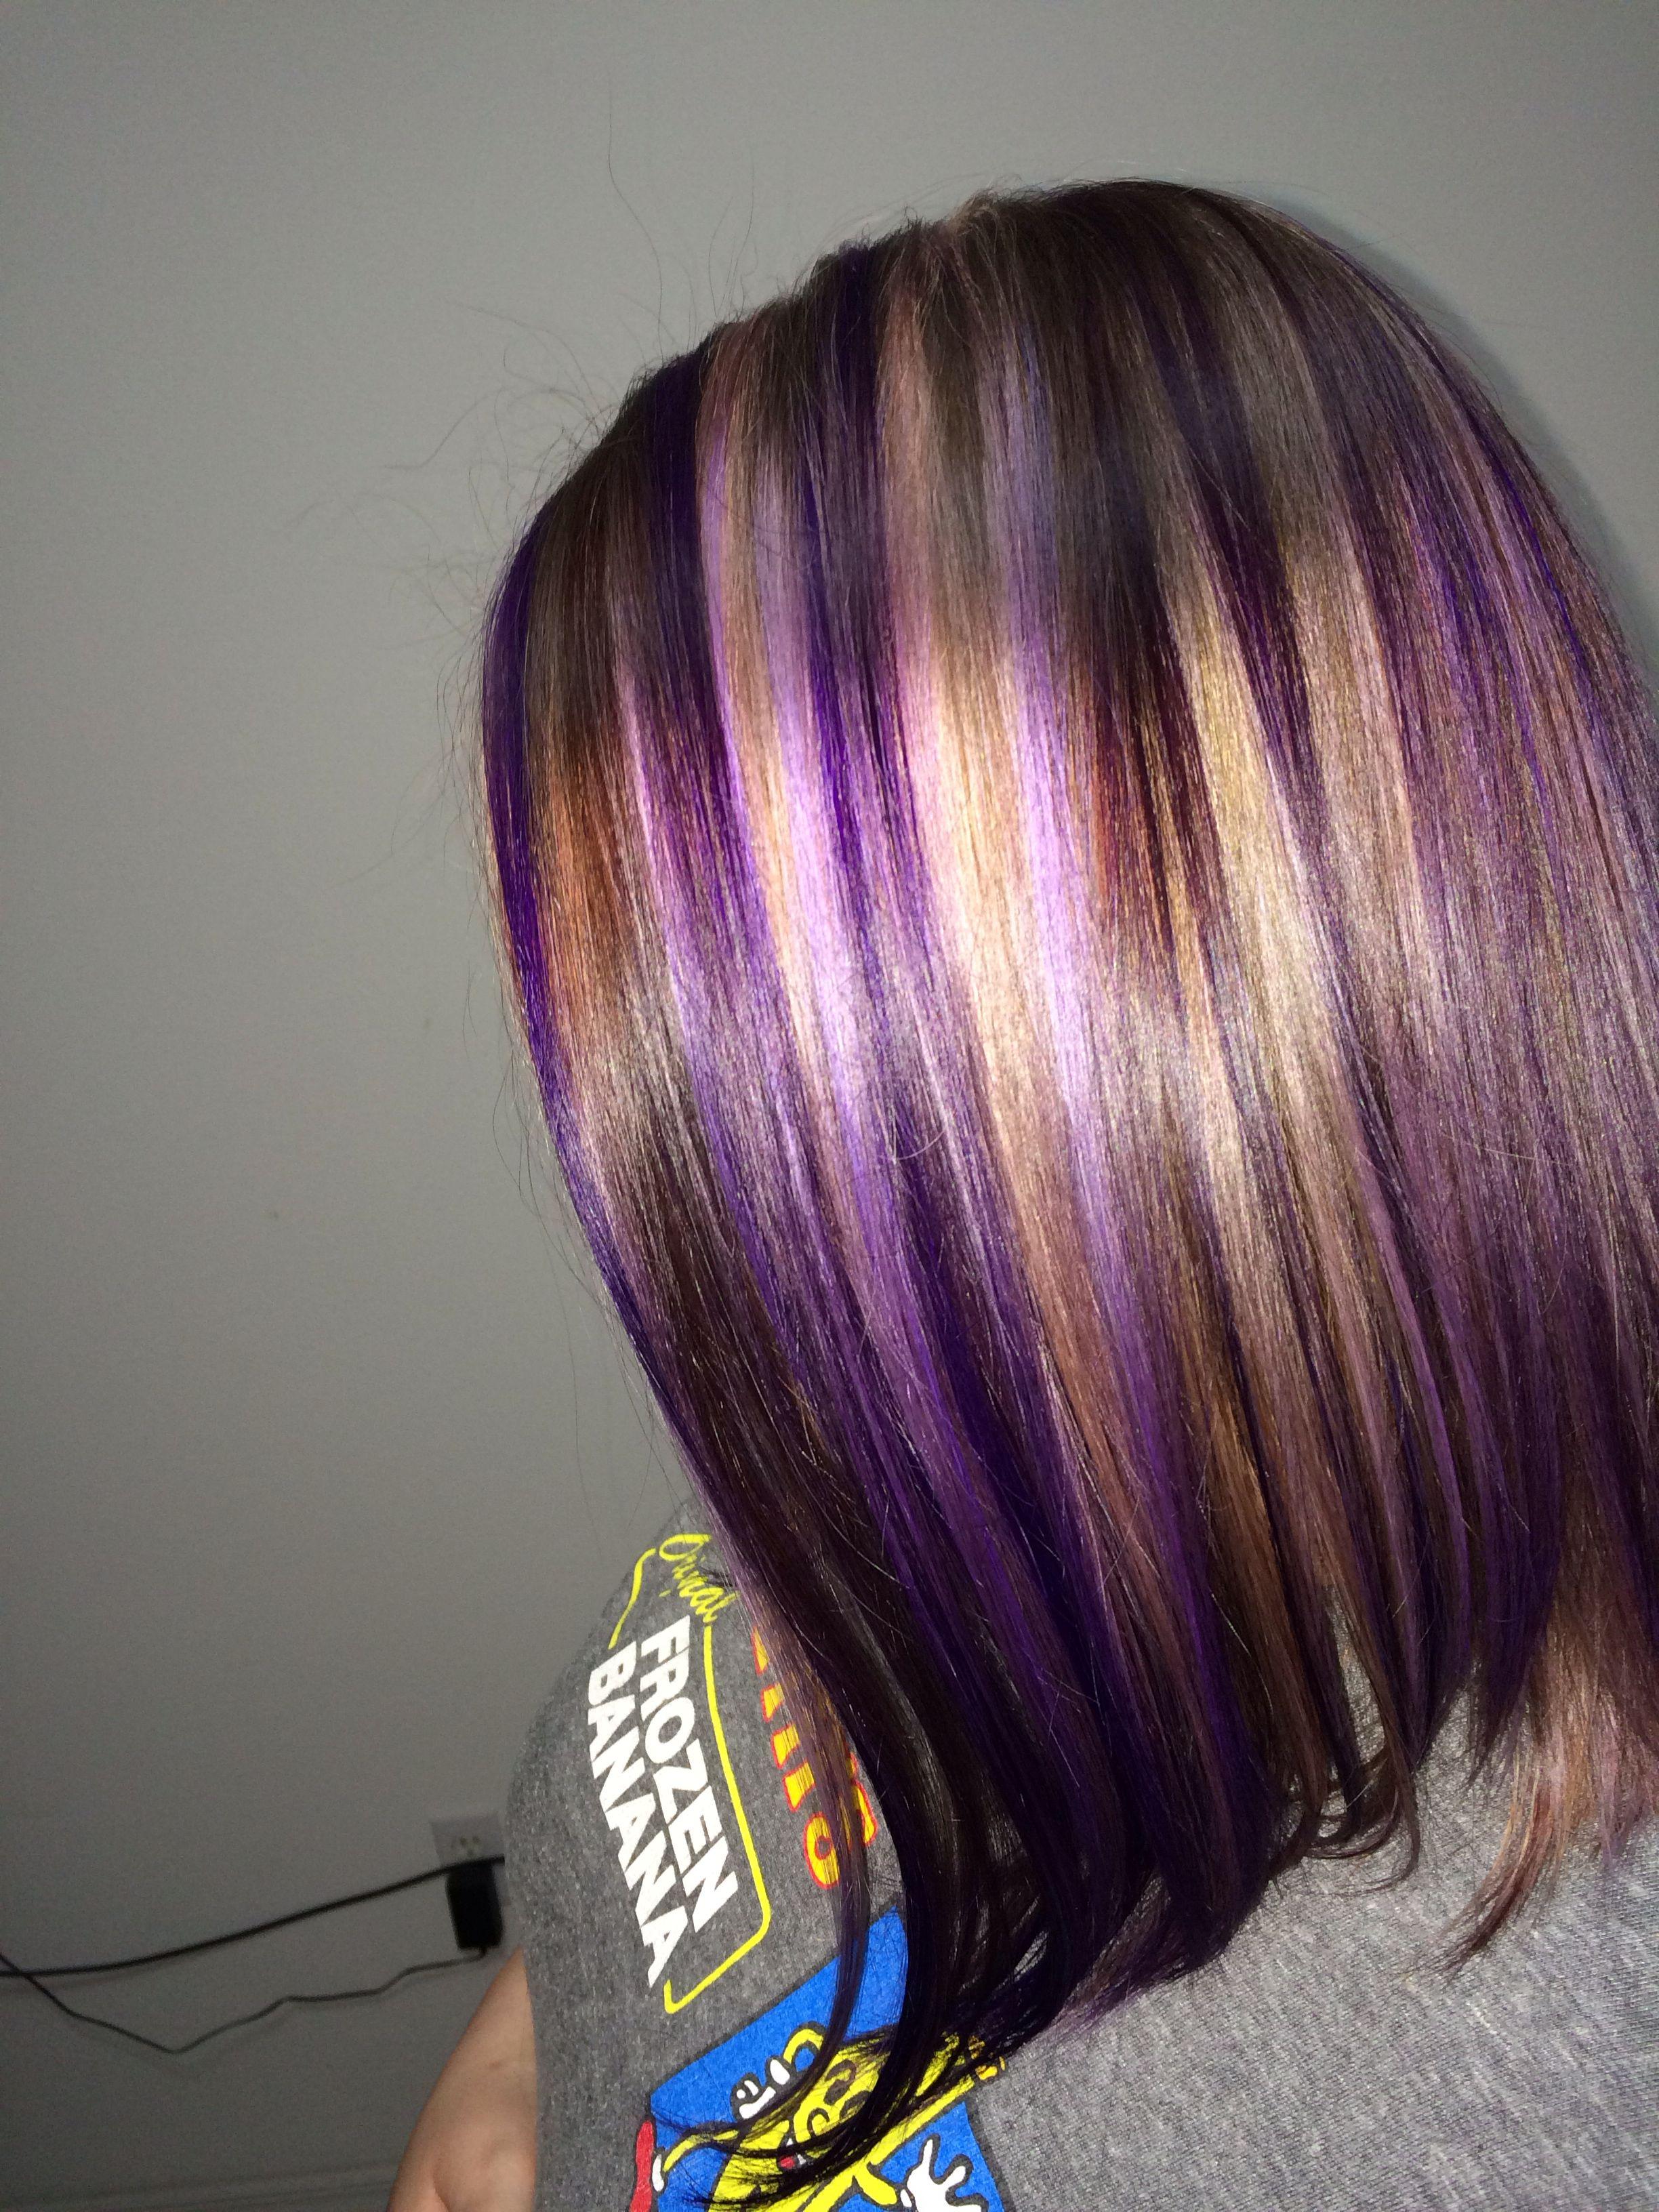 Pravana Vivids Violet With Blonde Highlights And Brown Lowlights Hair Styles Hair Color Purple Blonde Hair Color